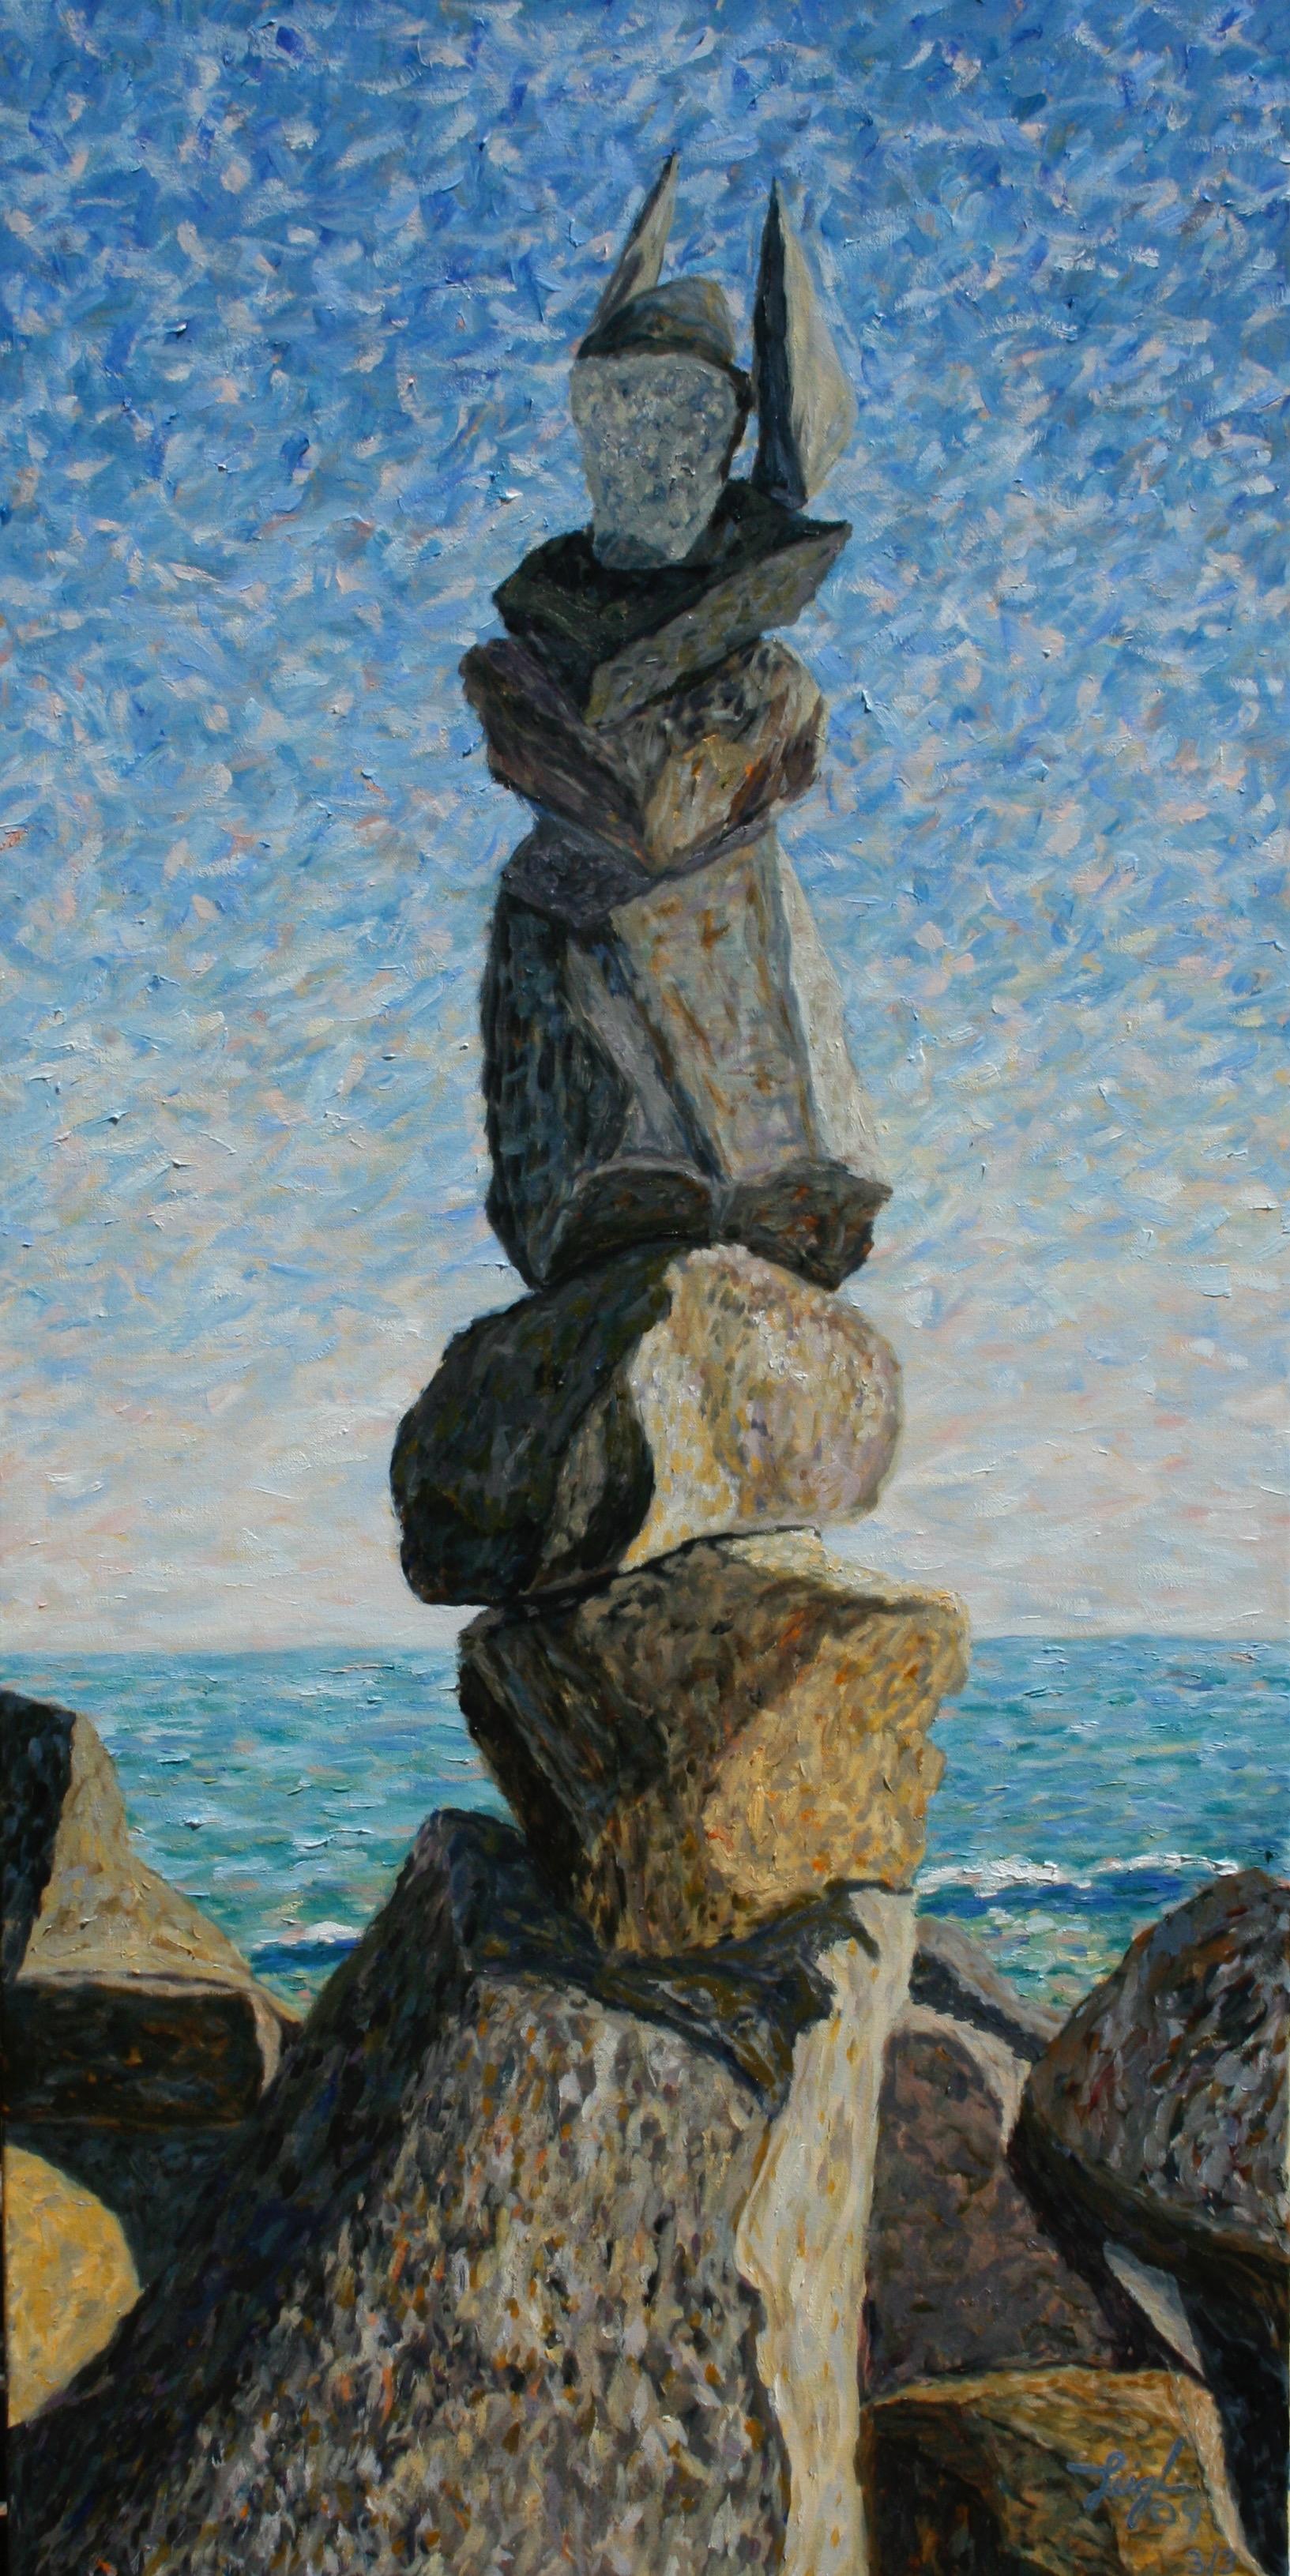 Rock Sculpture #3